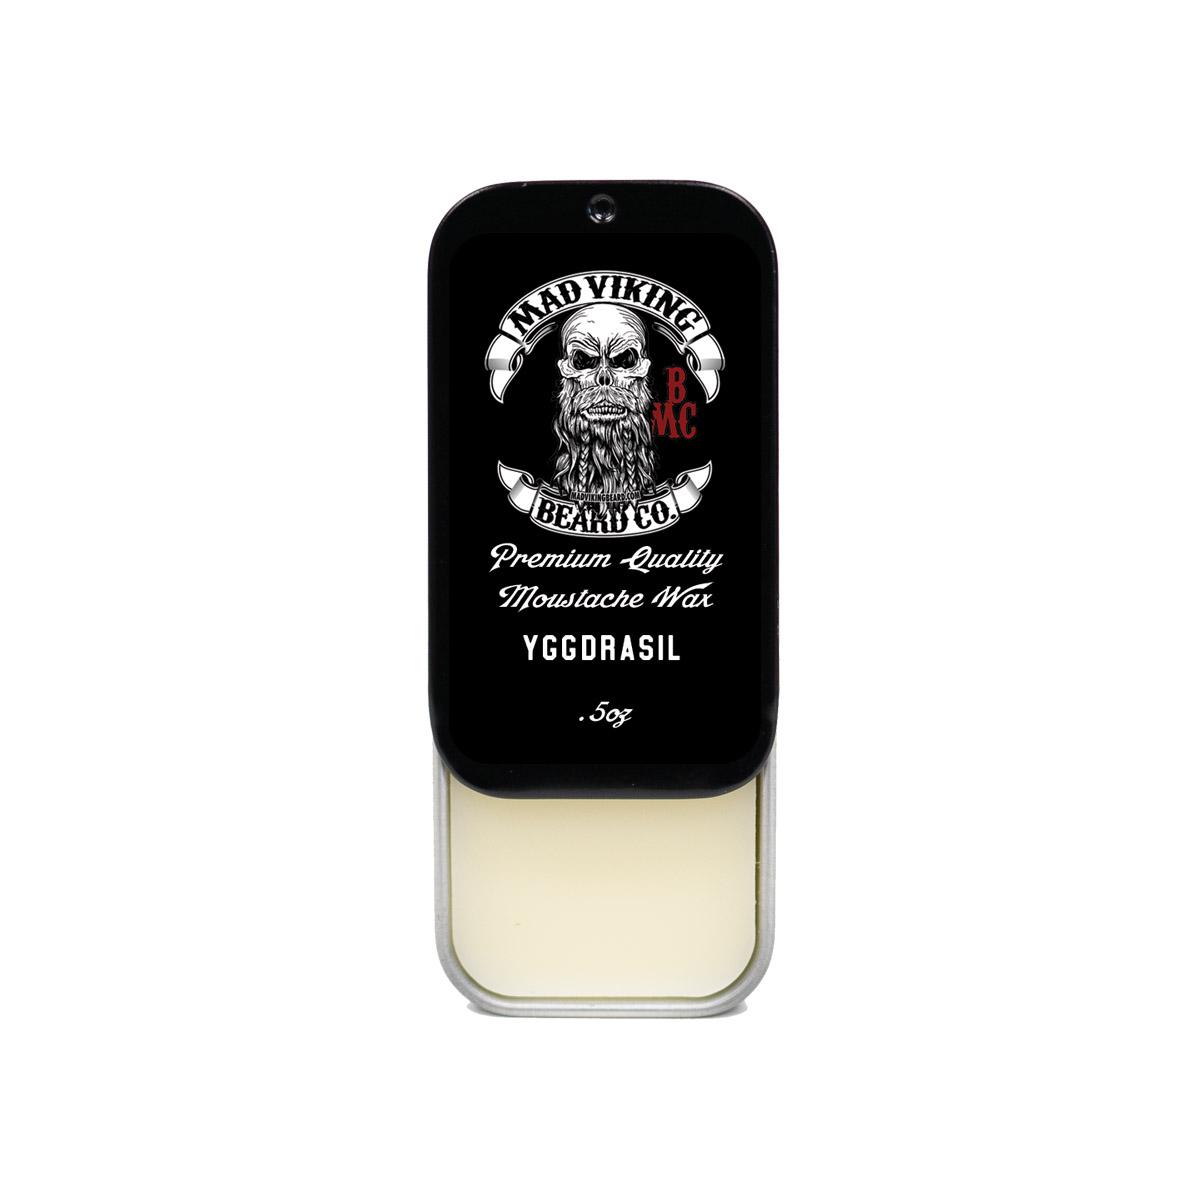 Mad Viking Yggdrasil Mustache Wax slide top tin